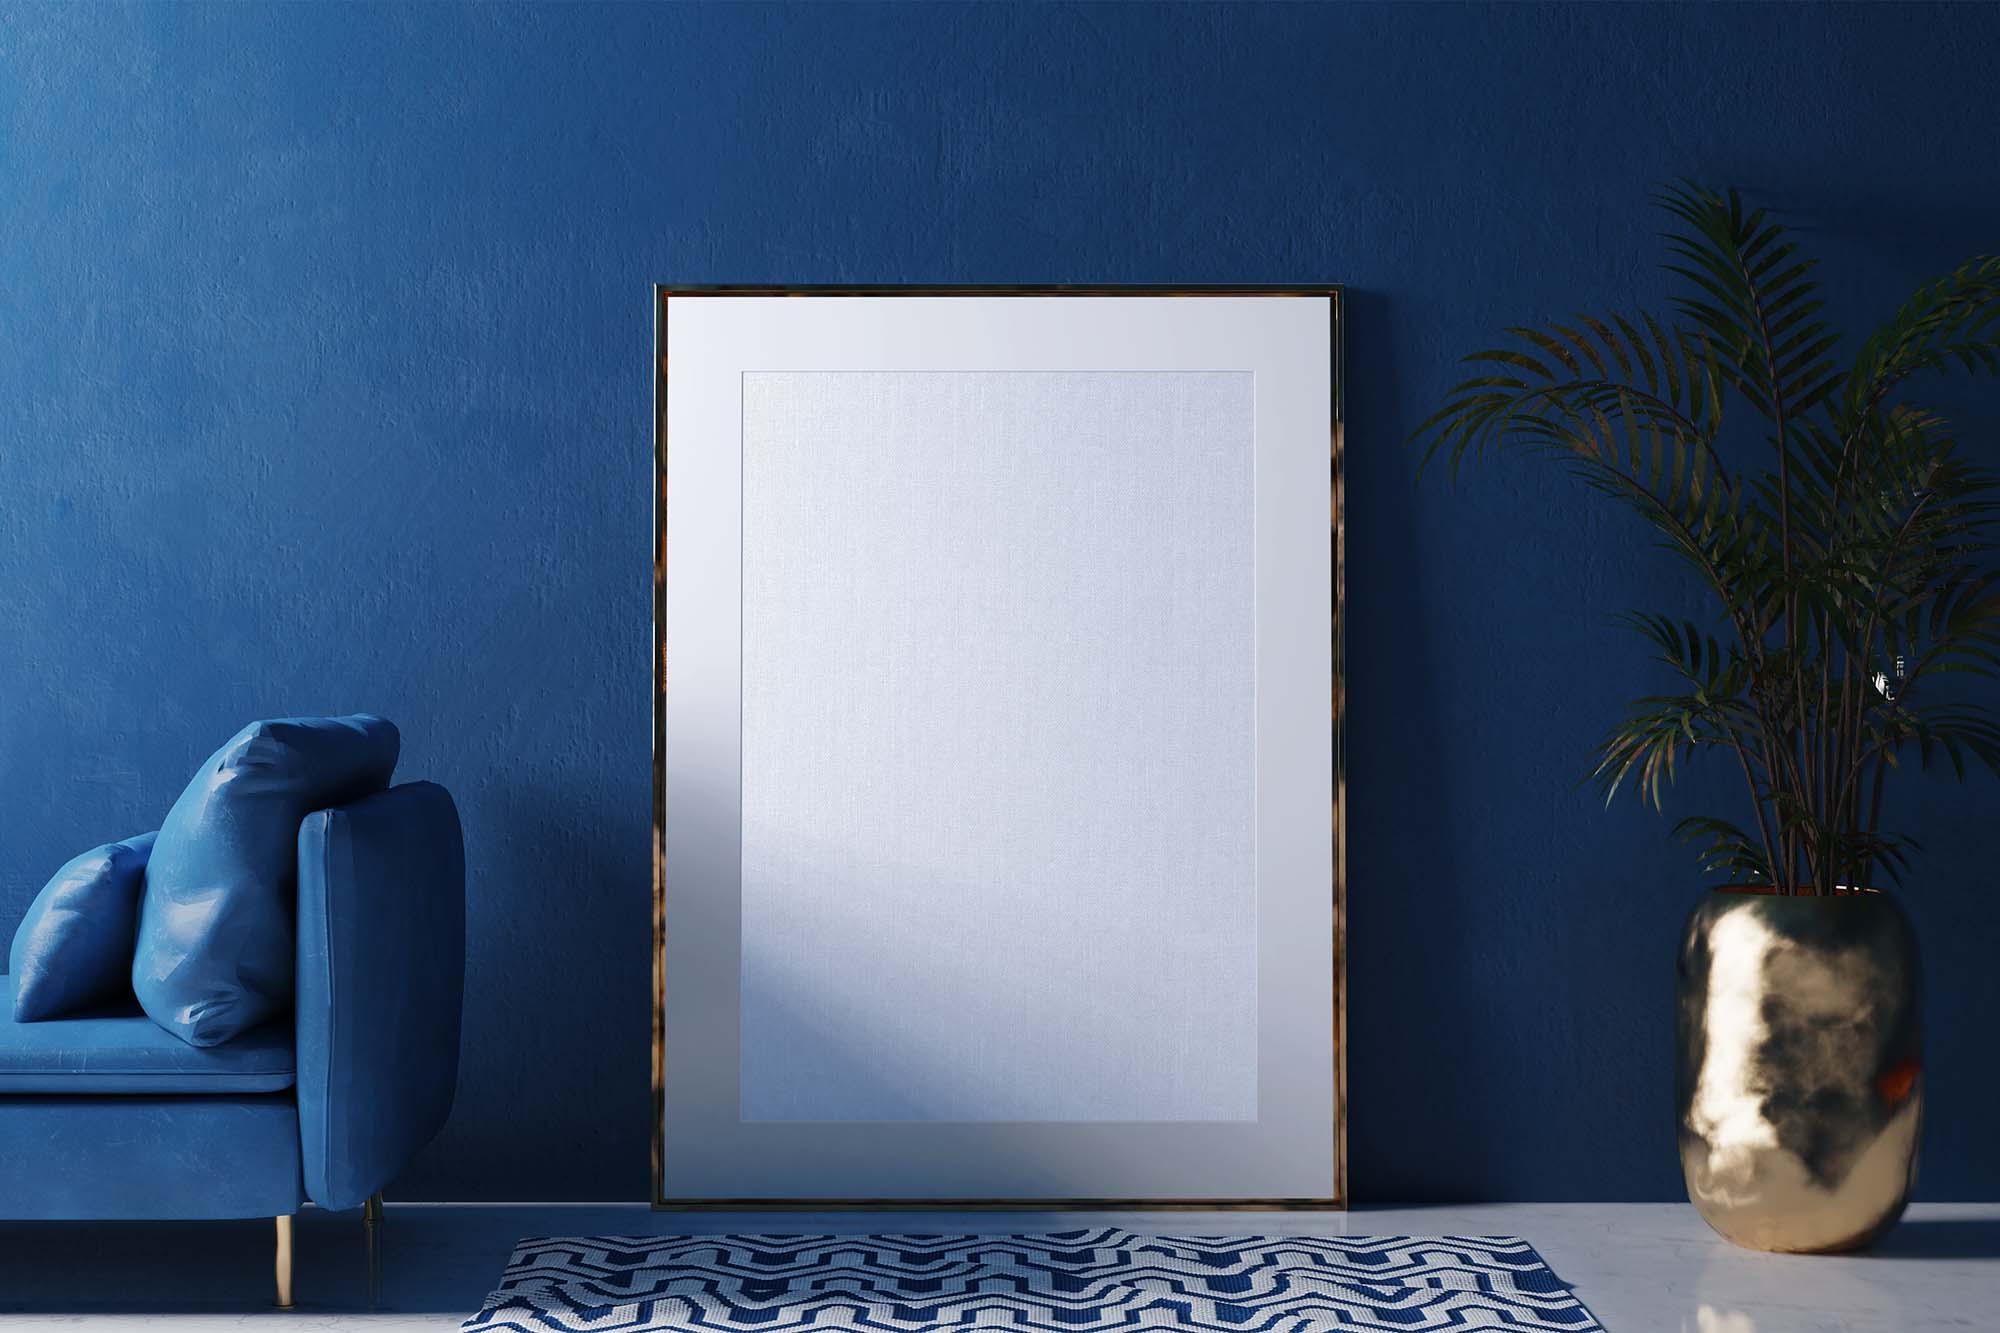 Blue Interior Poster Mockup 2